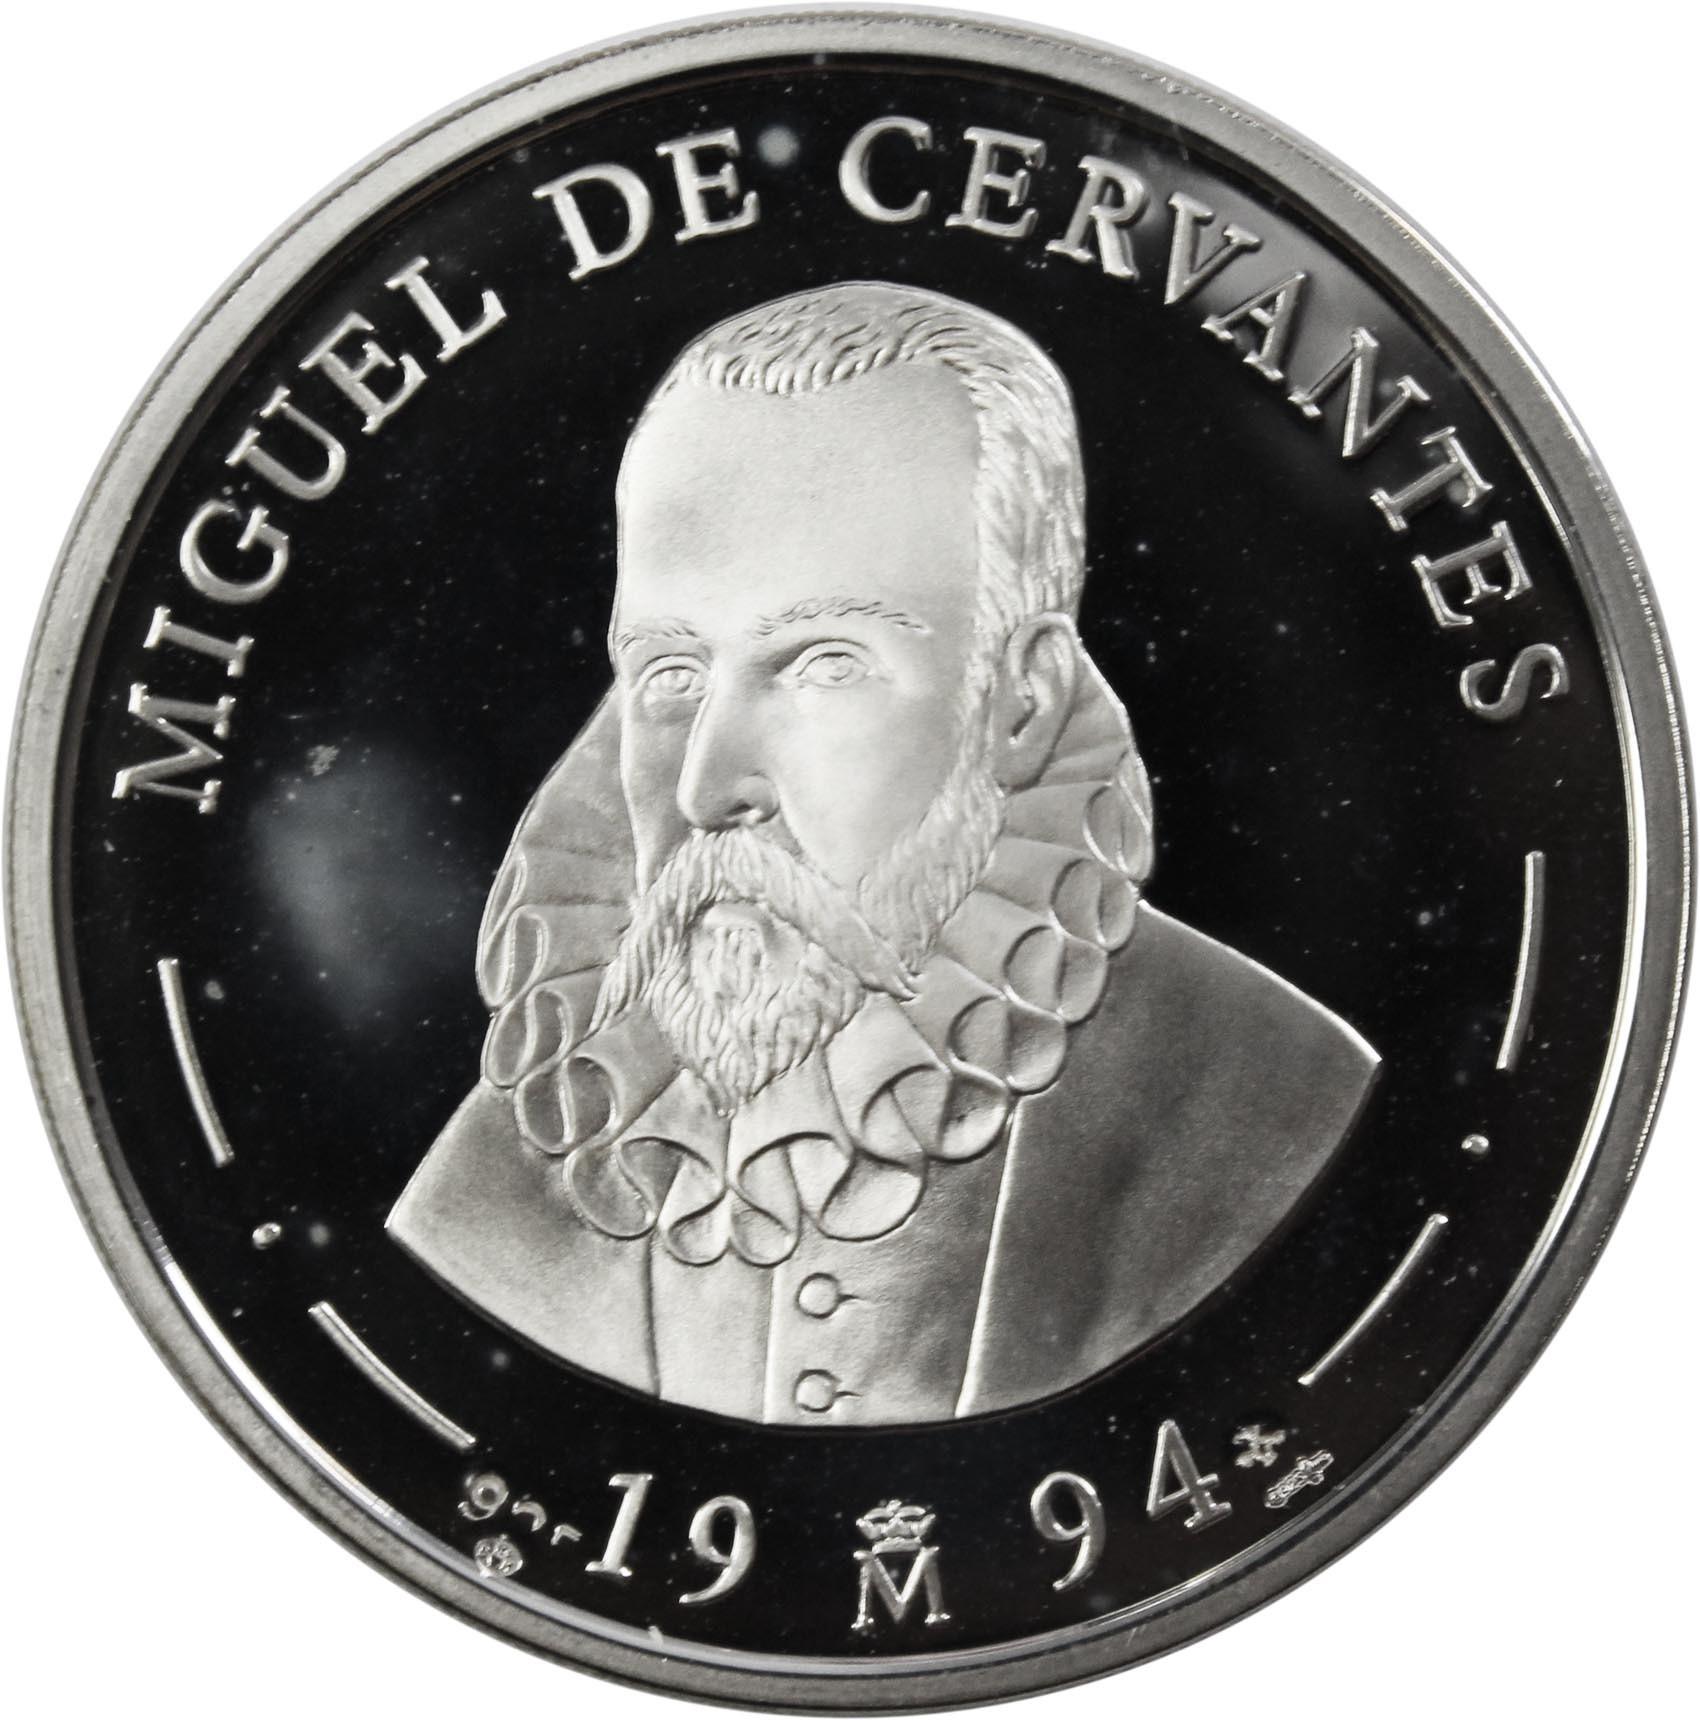 5 экю. Мигель Сервантес (автор Дон Кихота). Испания. Серебро. 1994 г. PROOF